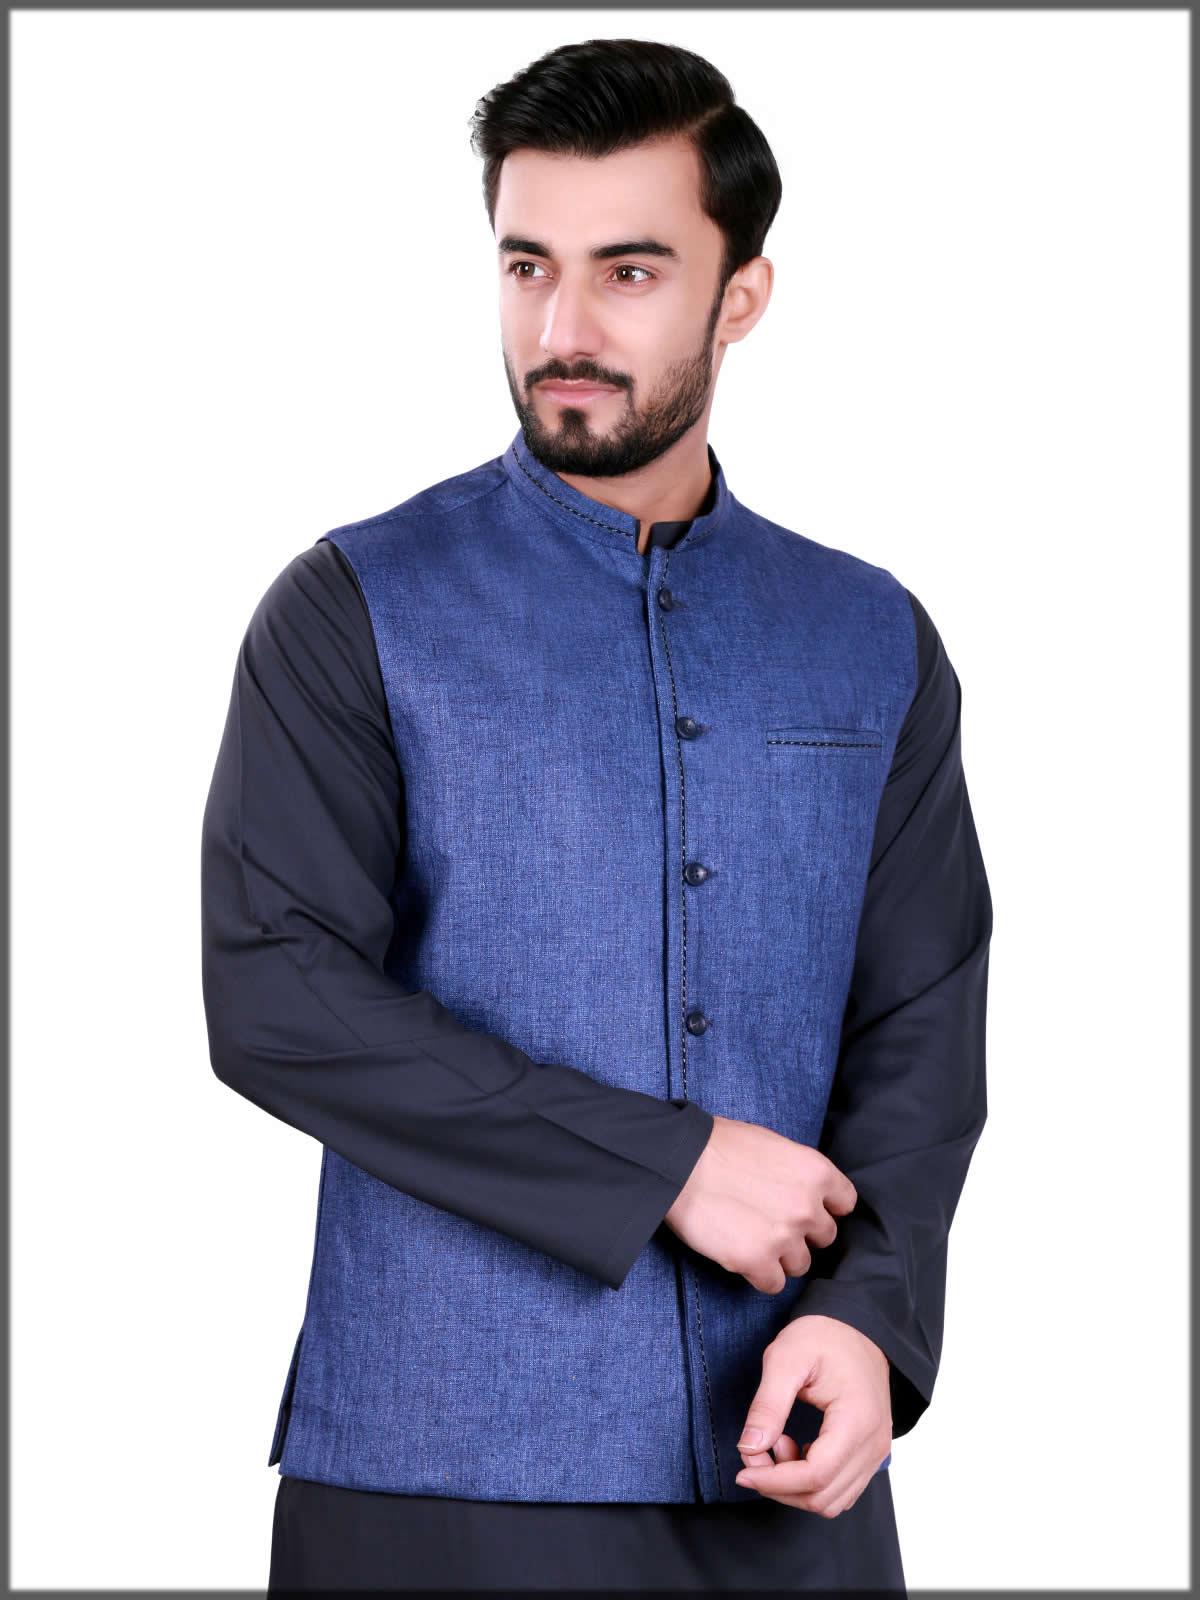 classy new blue waistcoat for men